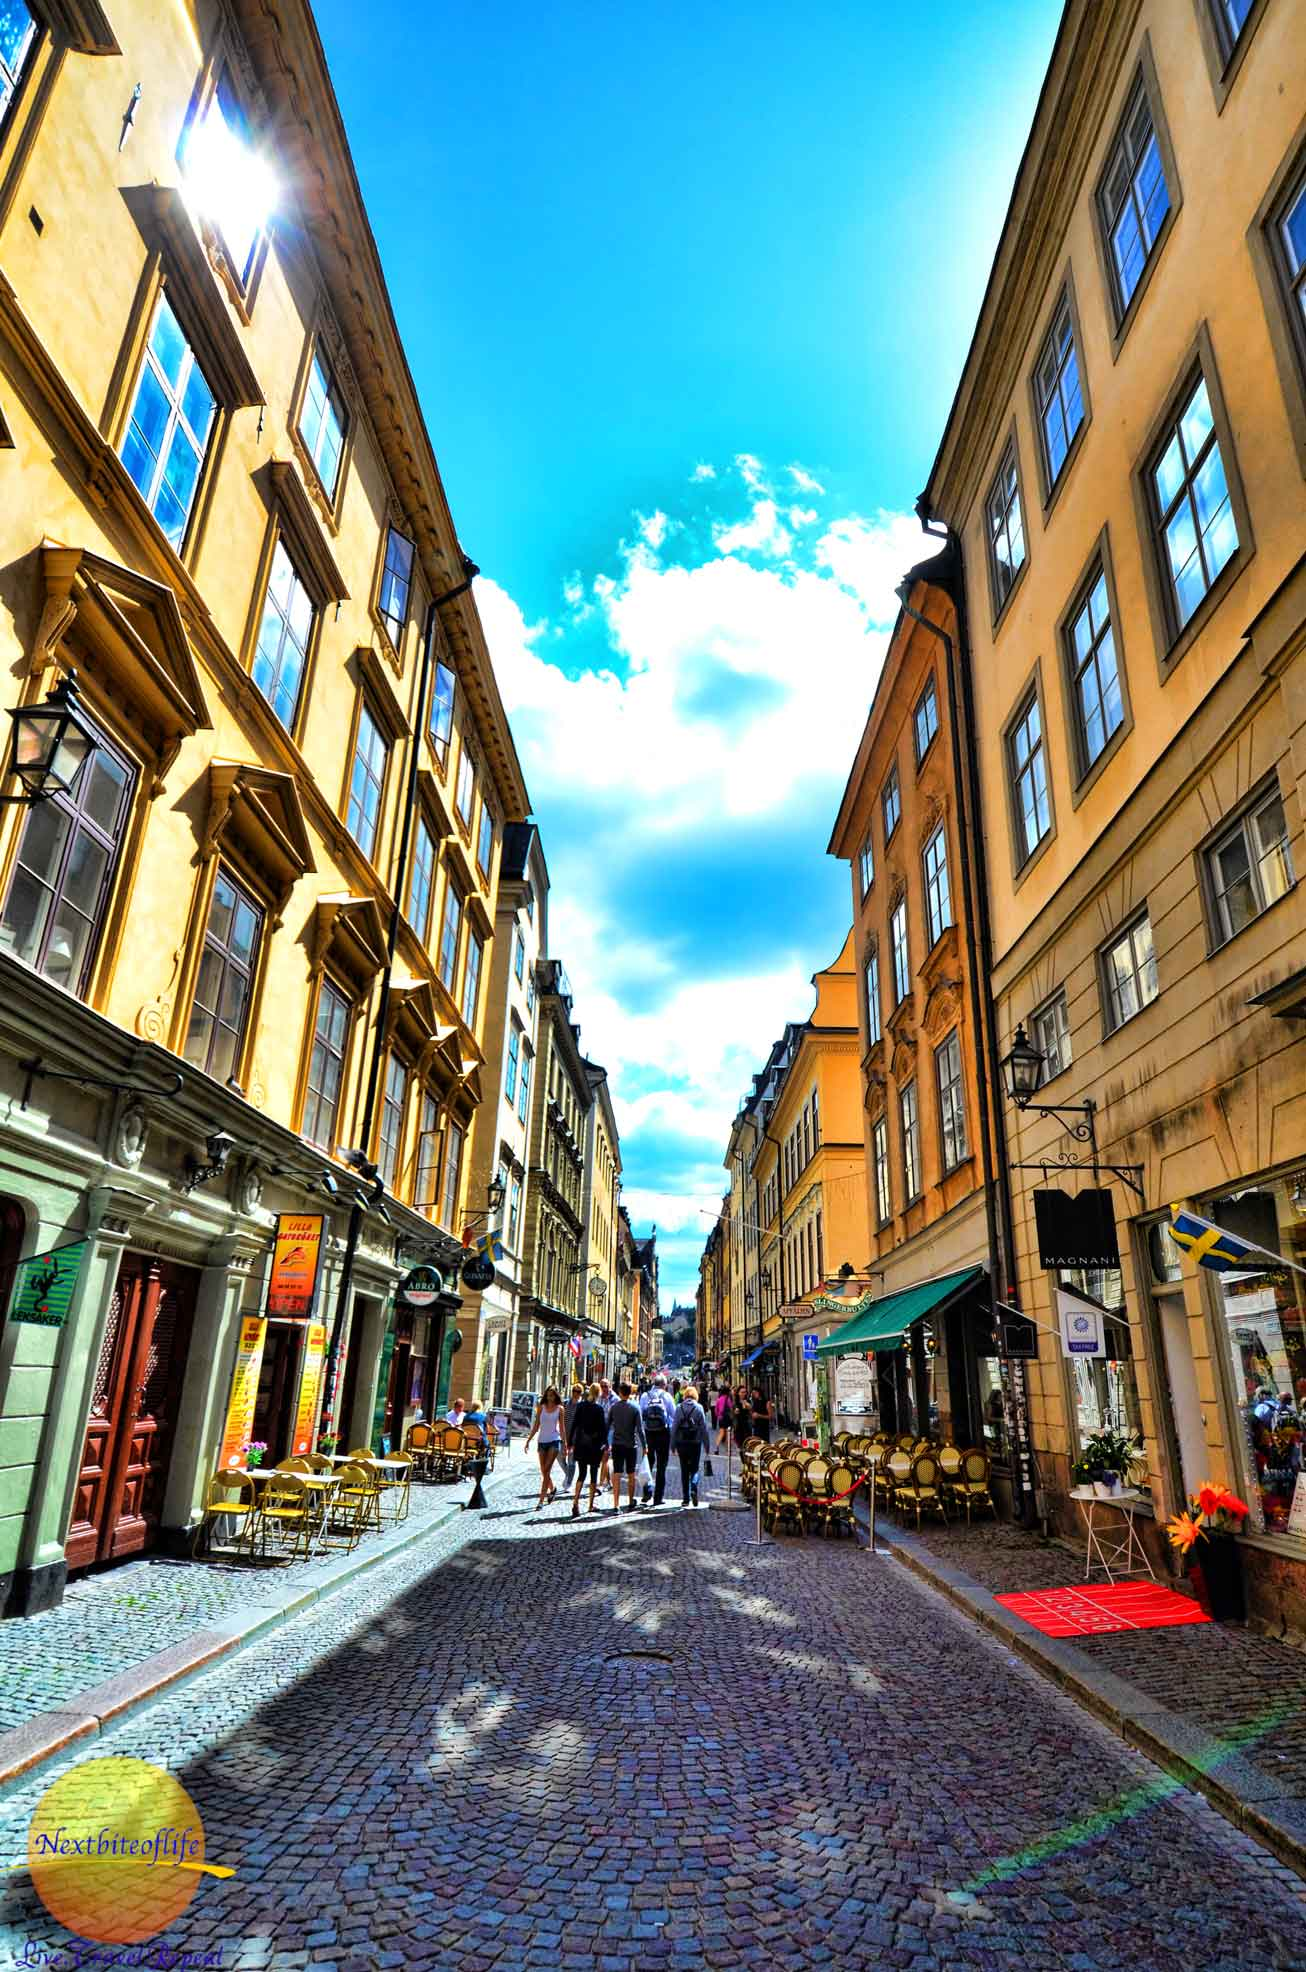 tbex stockholm gamla stan pic